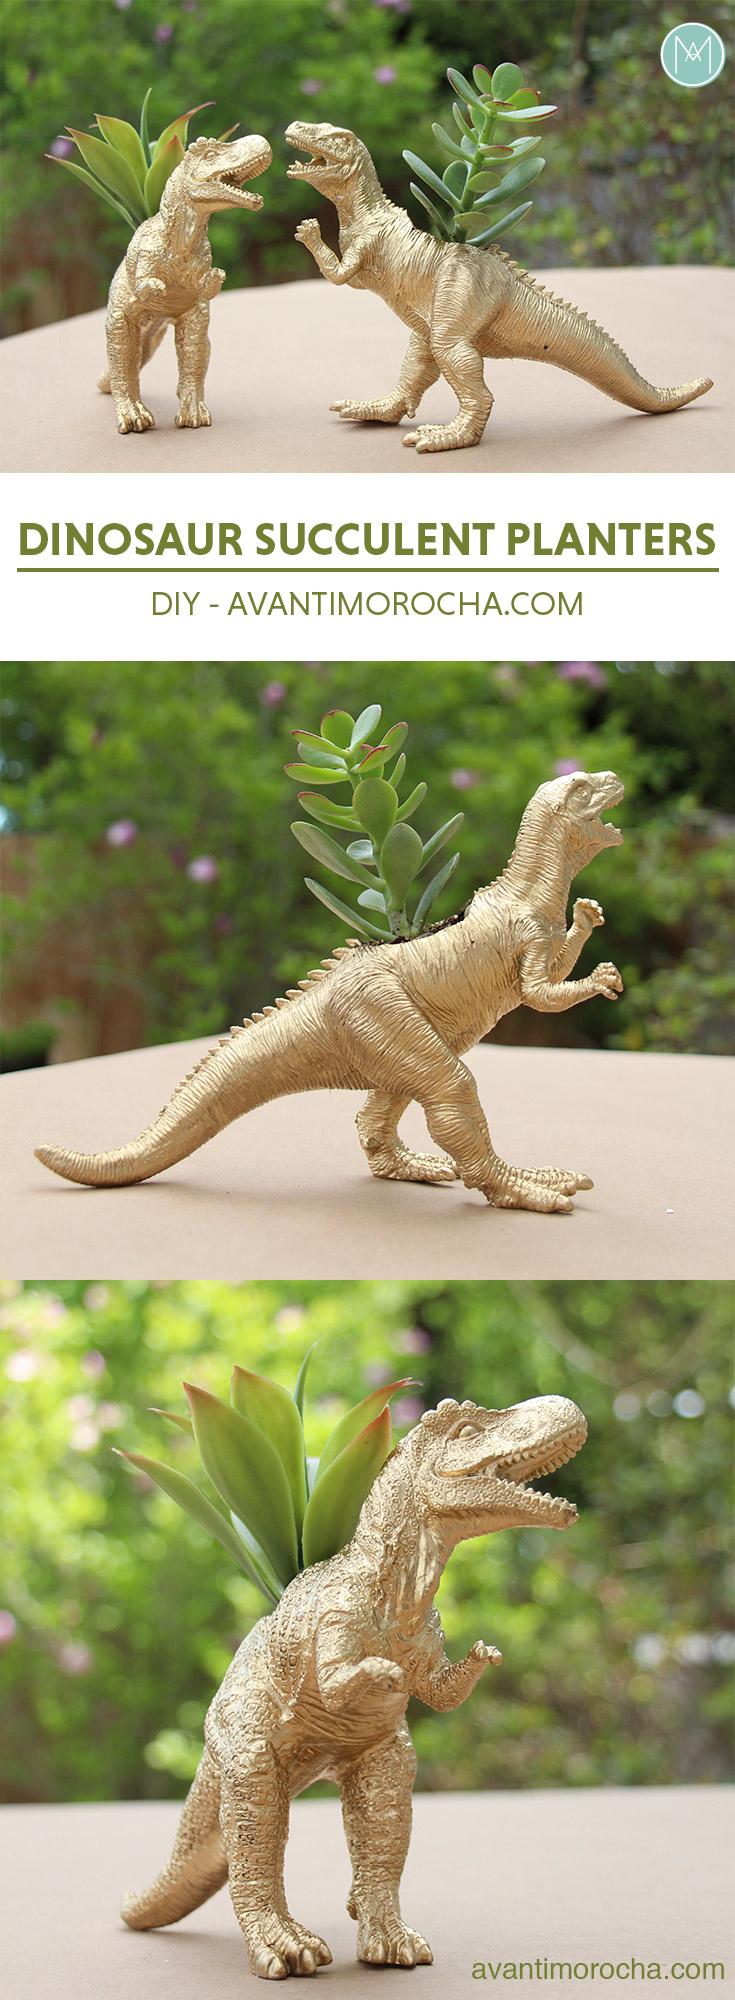 DIY Dinosaur Succulent Planter